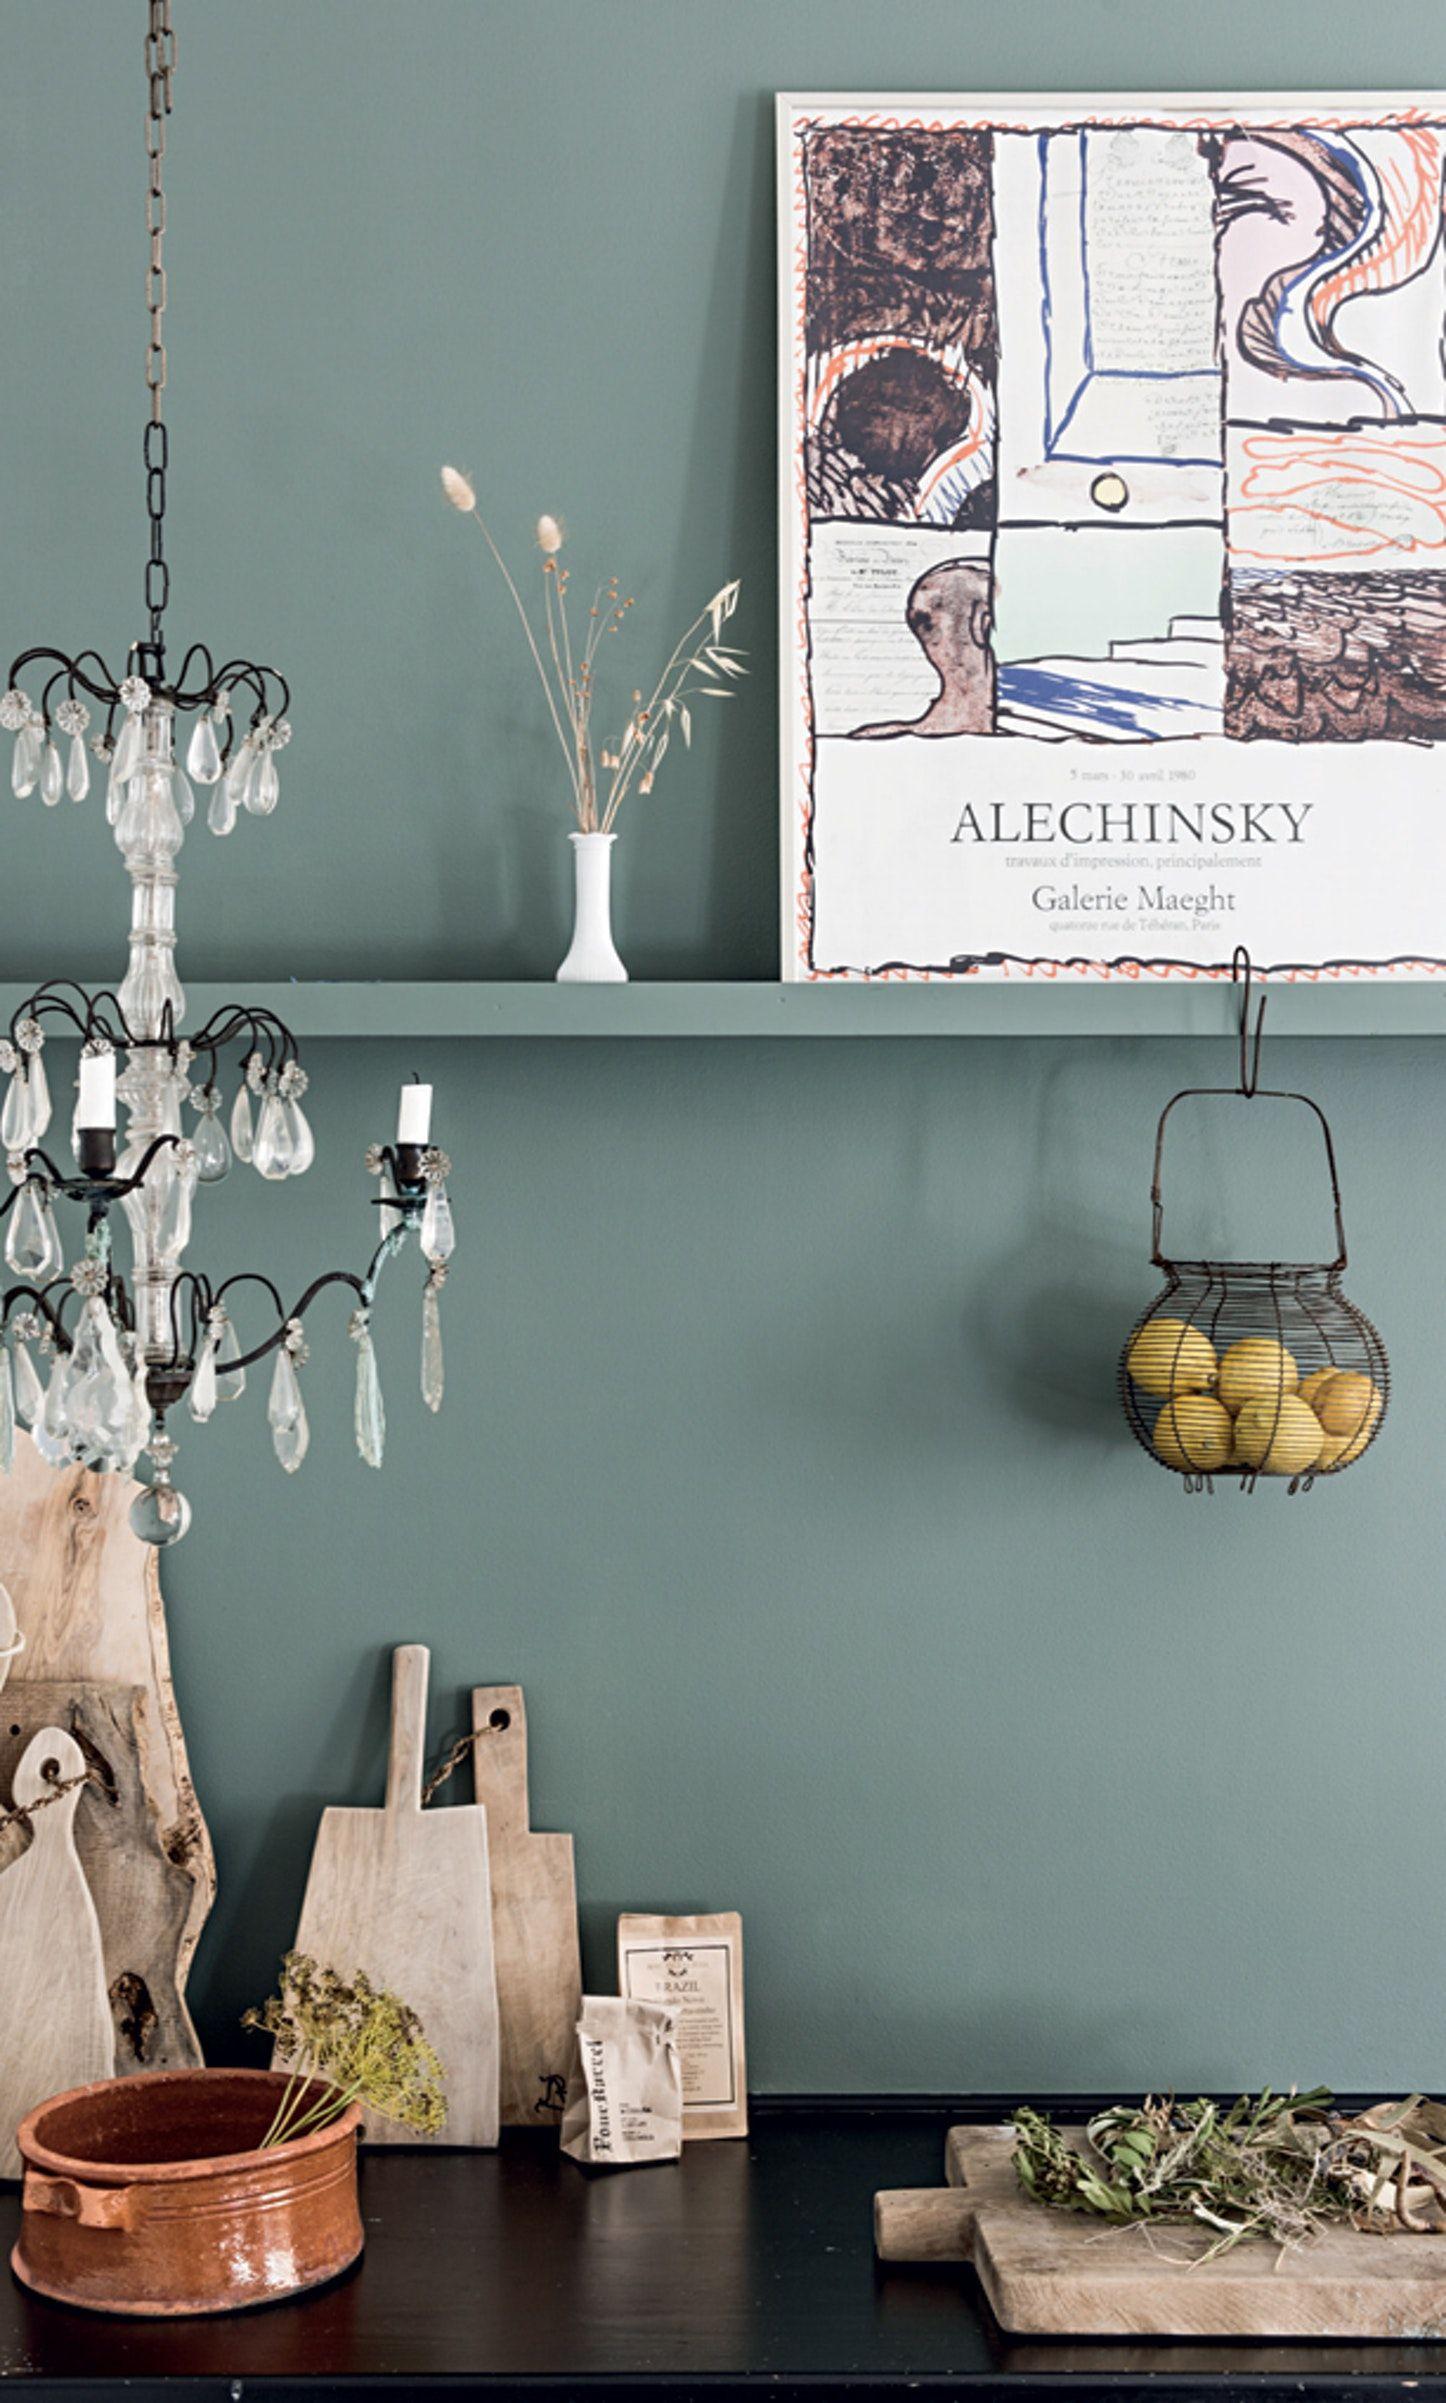 Pin Van Charlotte Kurth Op Kitchen Crush Keukenmuur Kleuren Muur Ideeen Klassiek Interieur